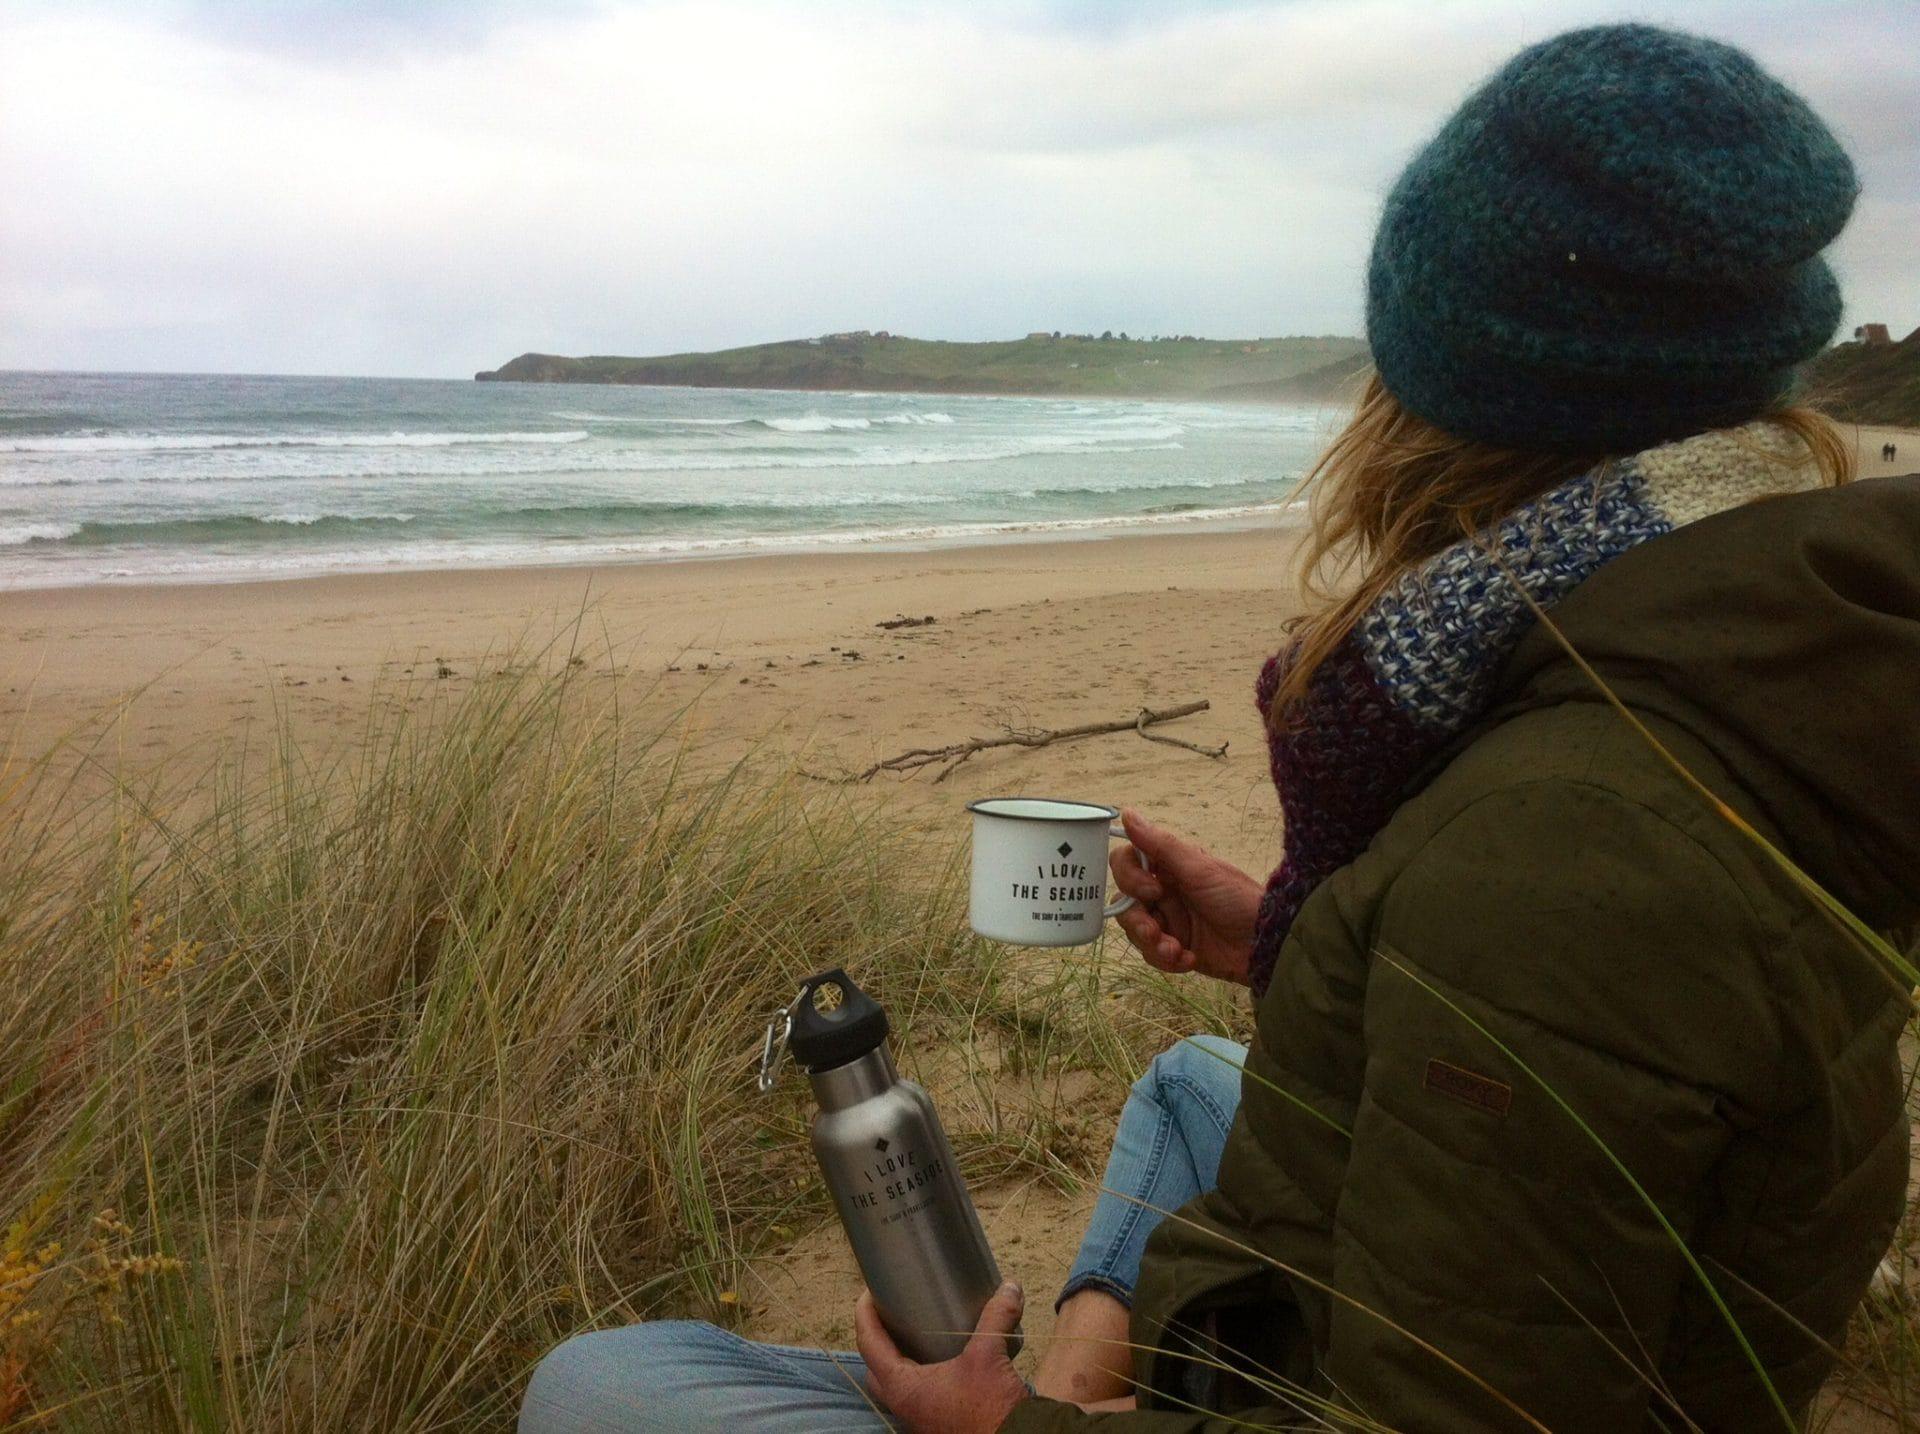 thermos-flask-ilts-beach